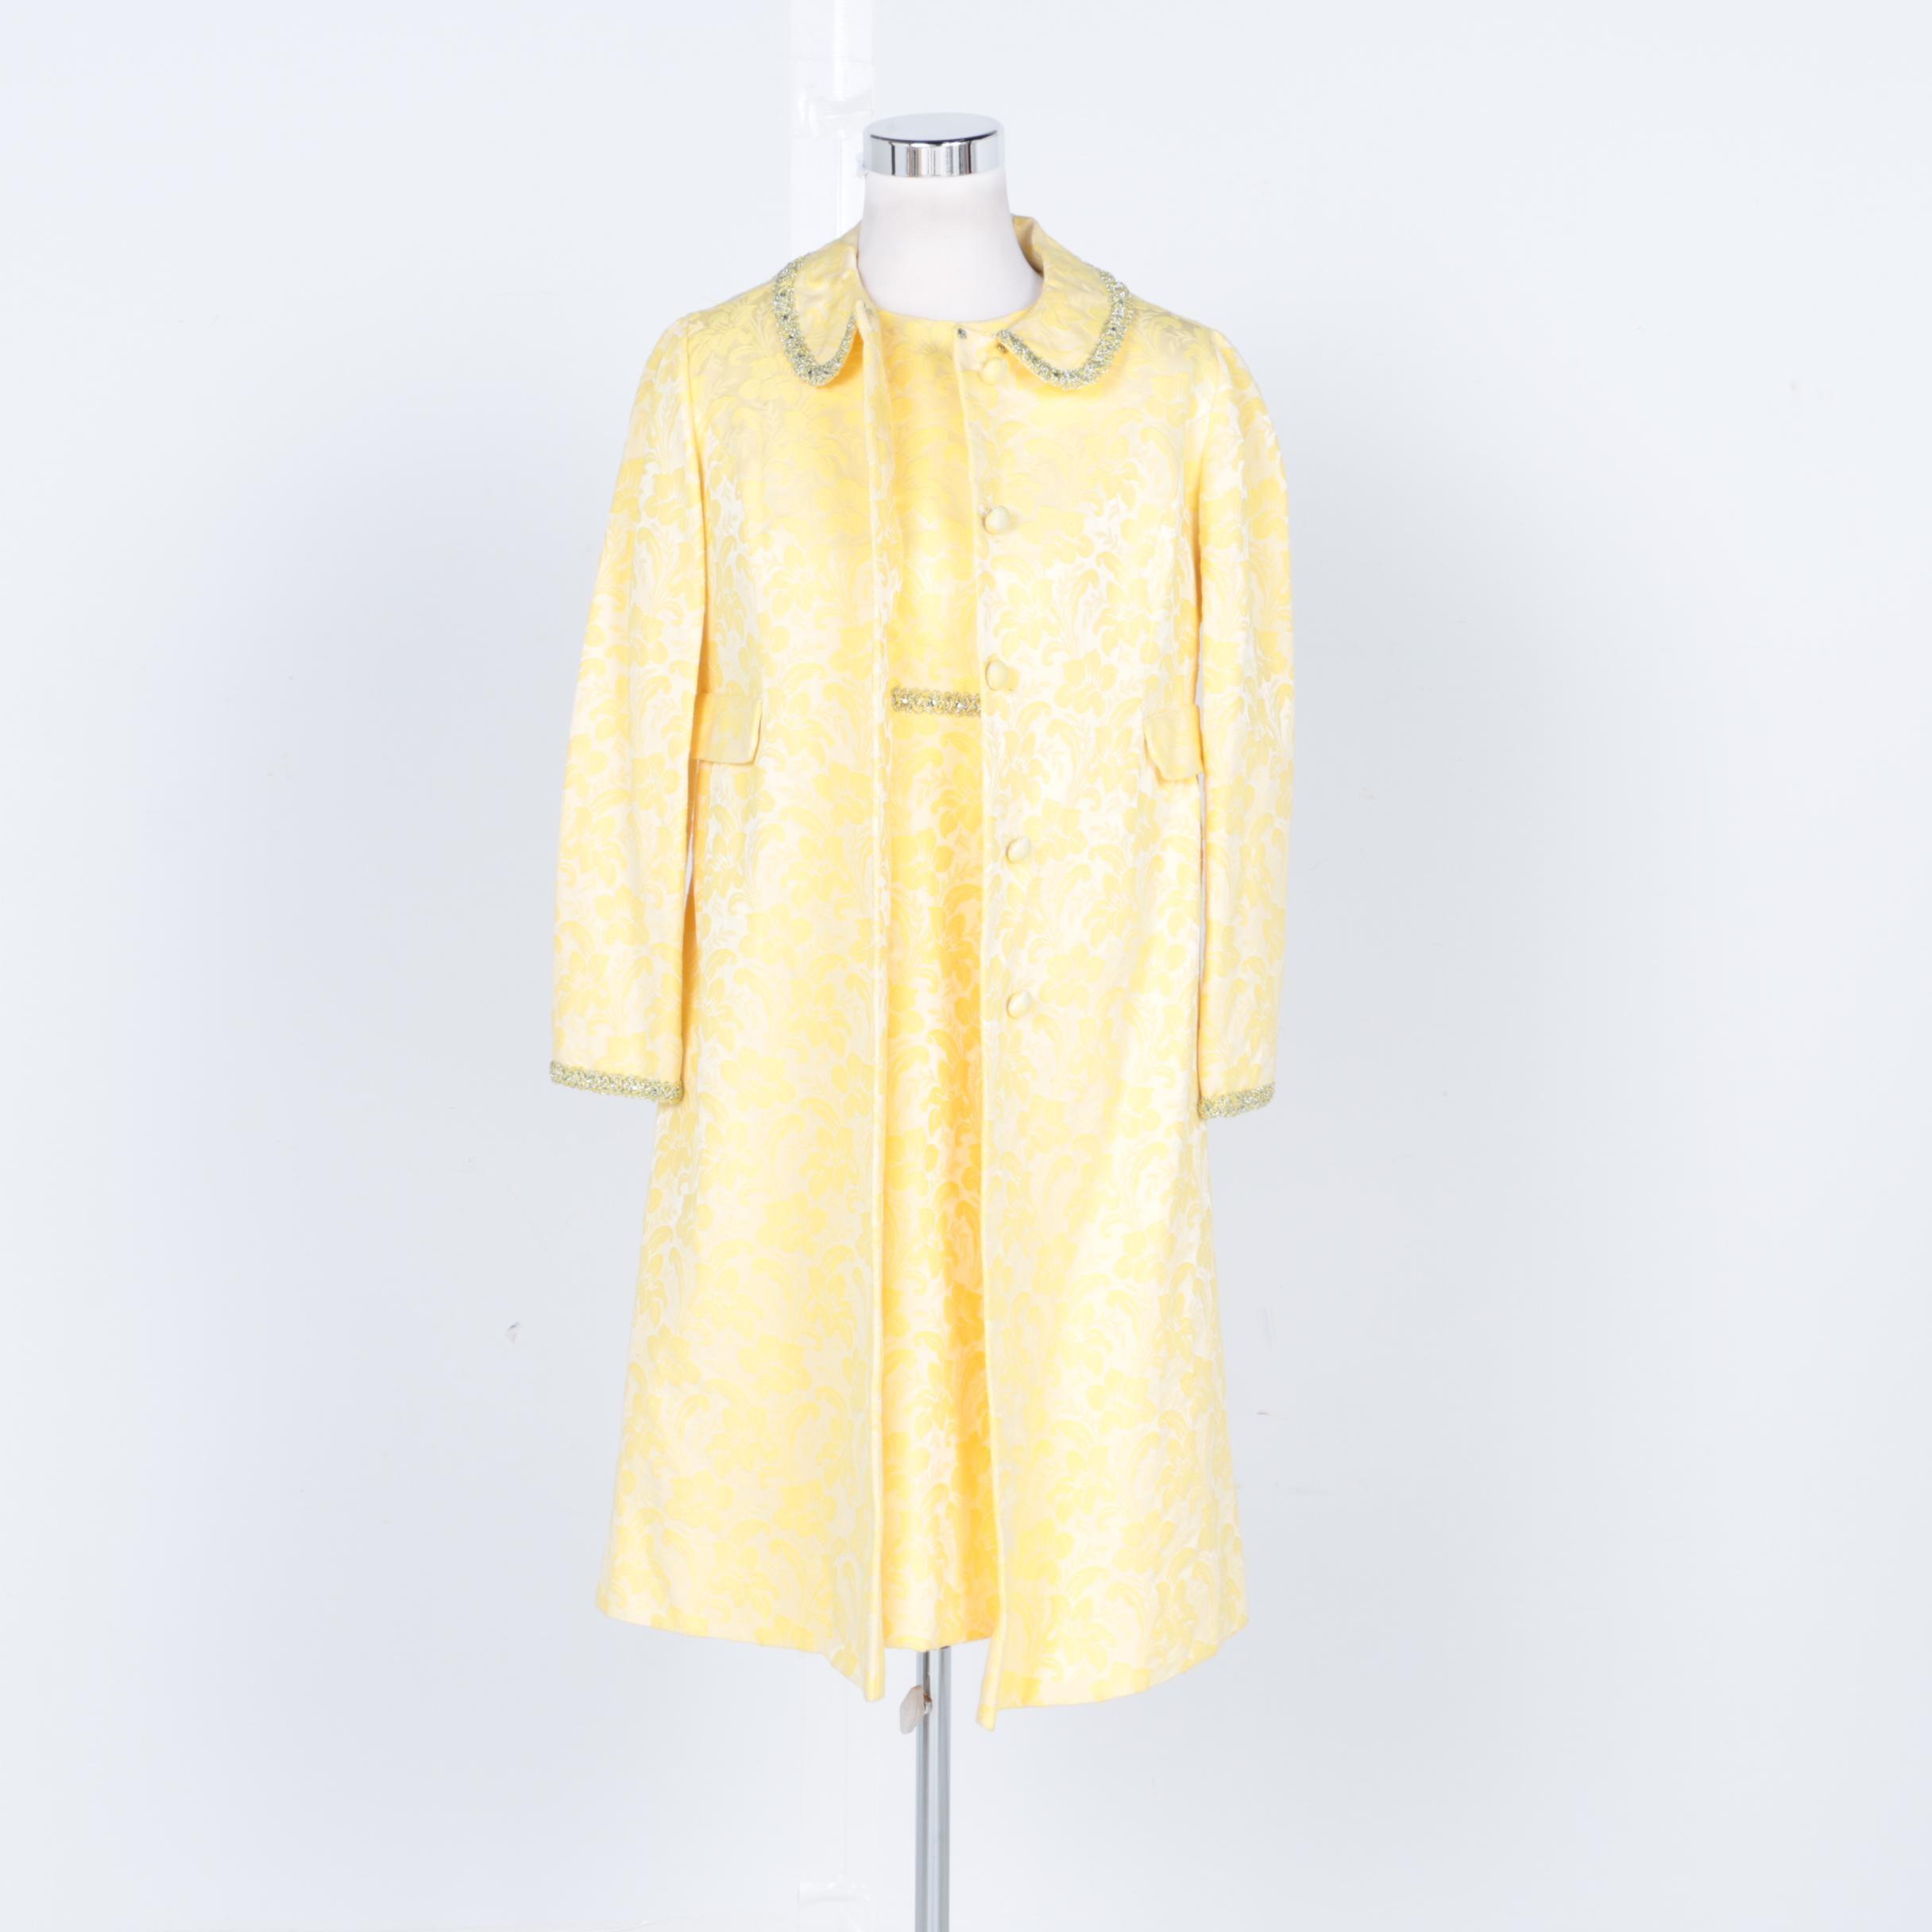 Circa 1960's Leslie Fay Coat and Dress